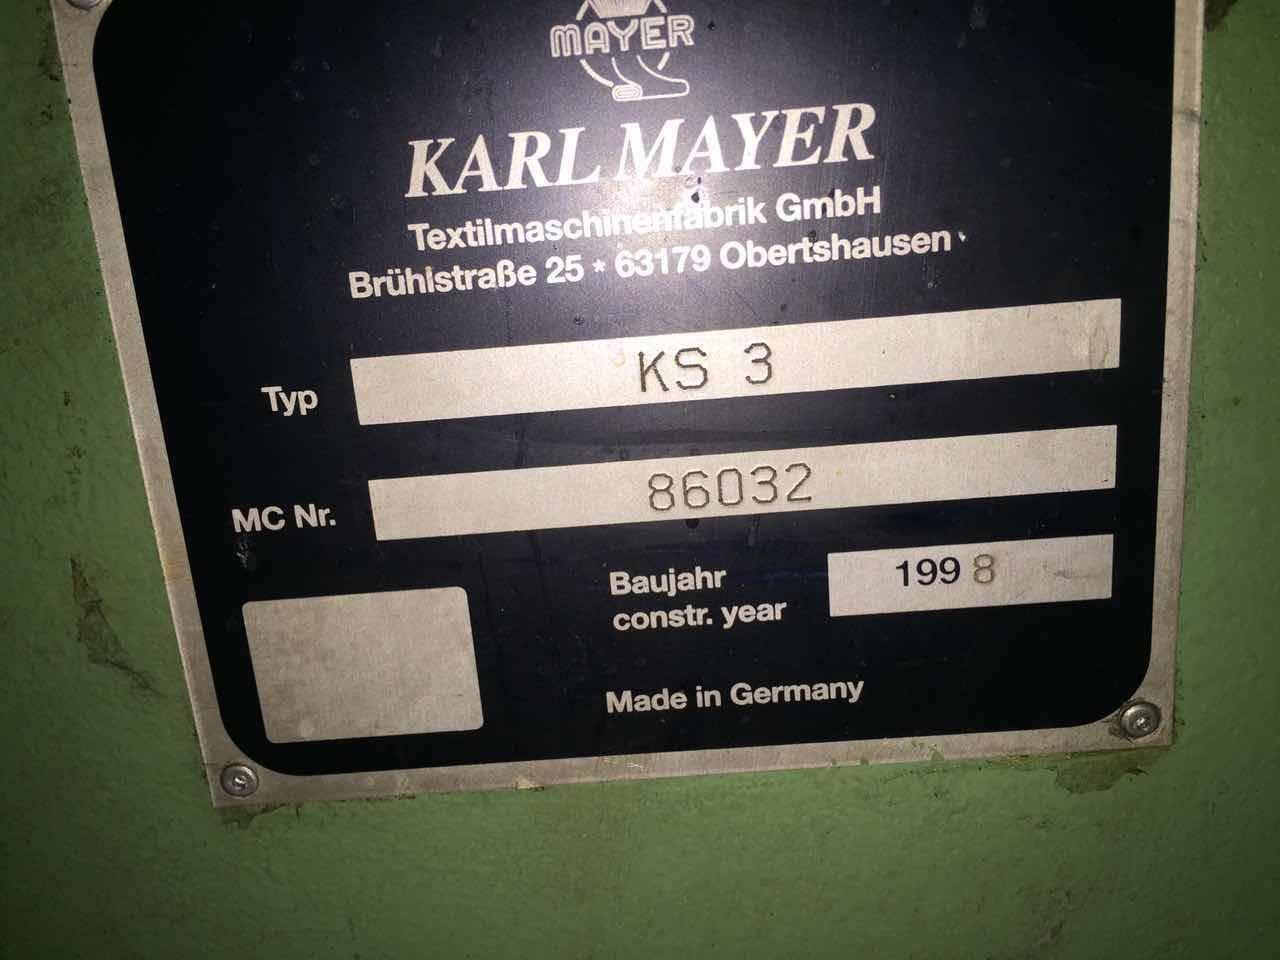 karl mayer warp knitting machineks2 ks3